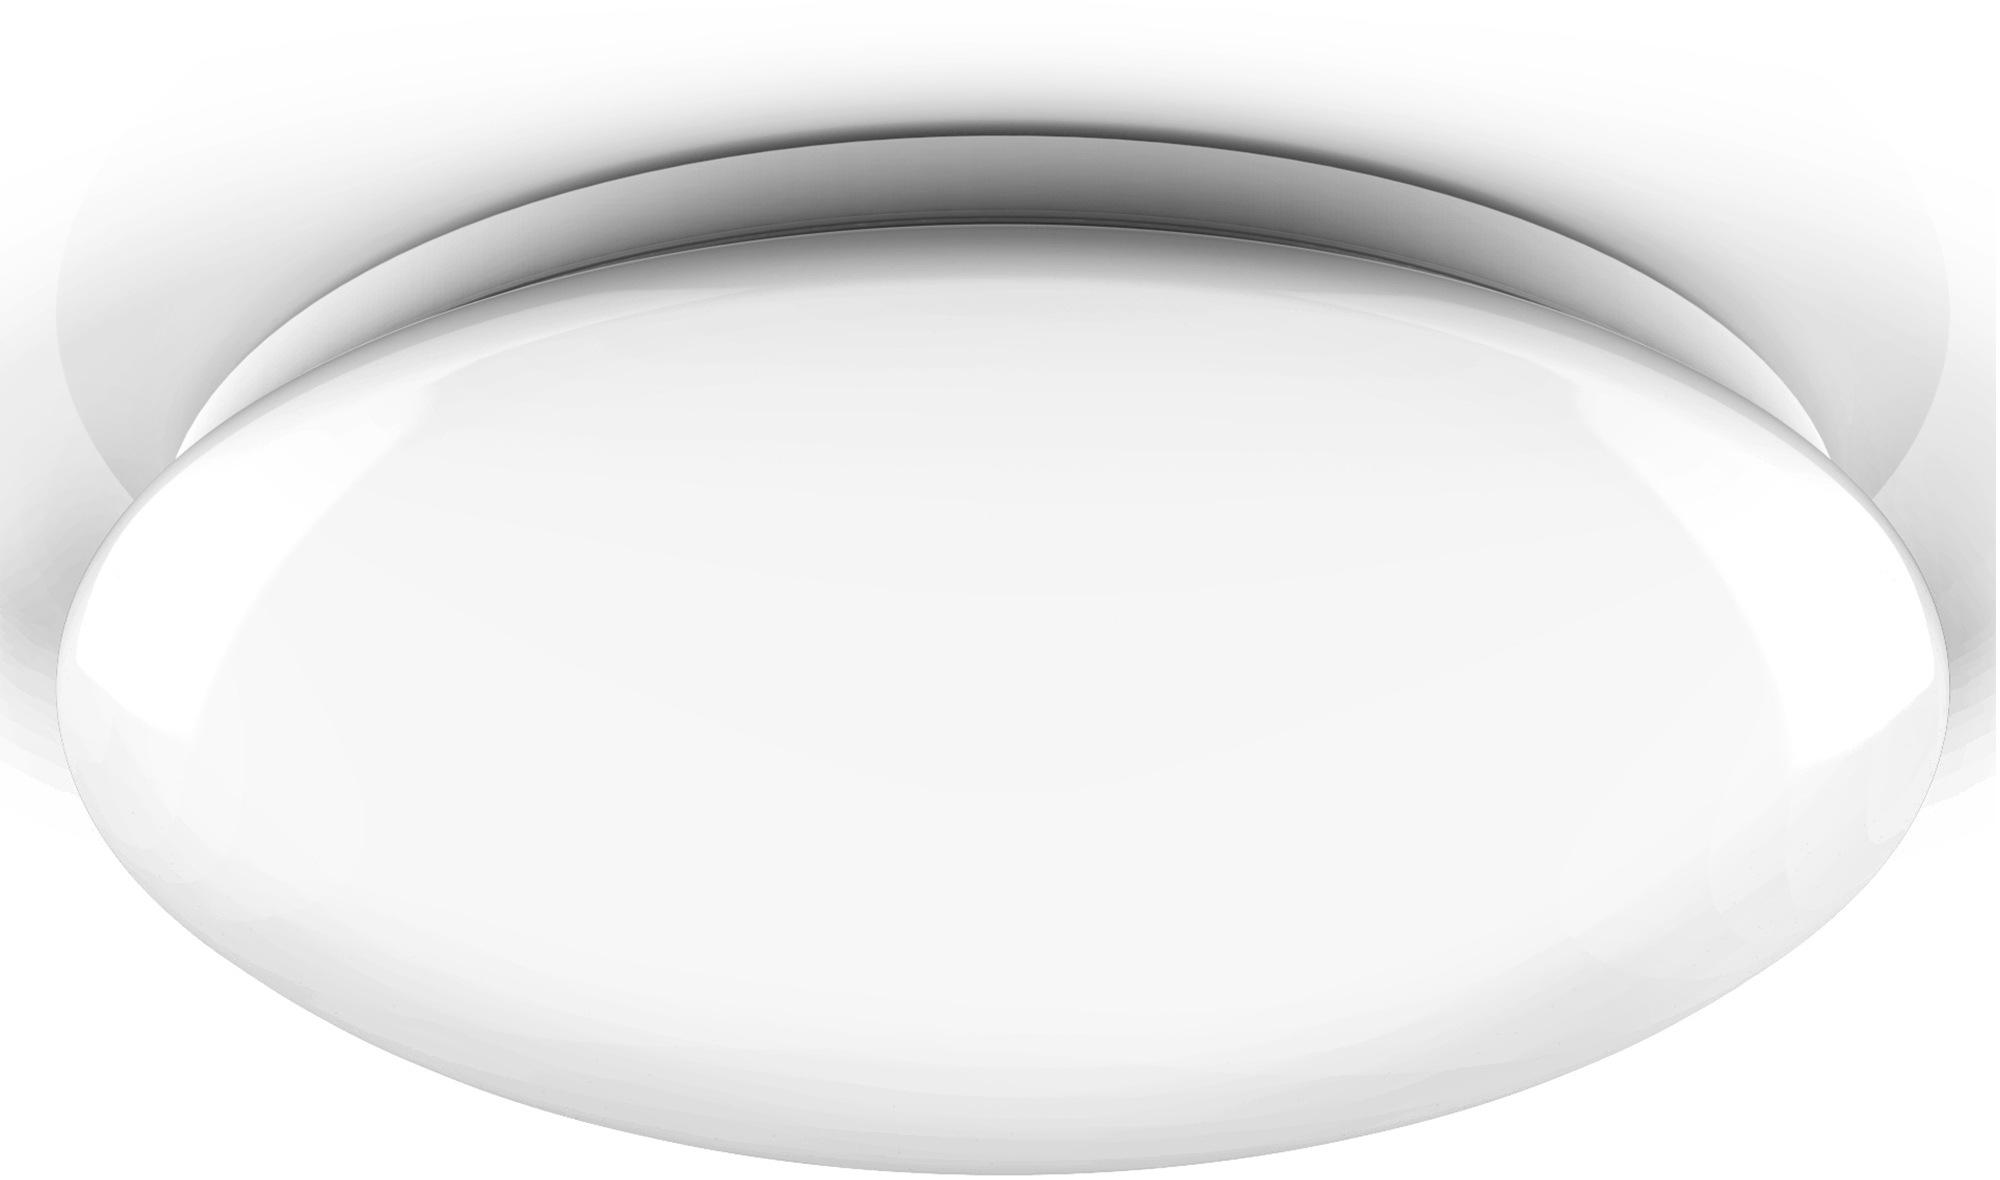 B.K.Licht LED Deckenleuchte Tucana, LED-Board, Neutralweiß, LED Bad Deckenlampe inkl. 18W 1600lm Bad-Lampen IP44 Küche Flur